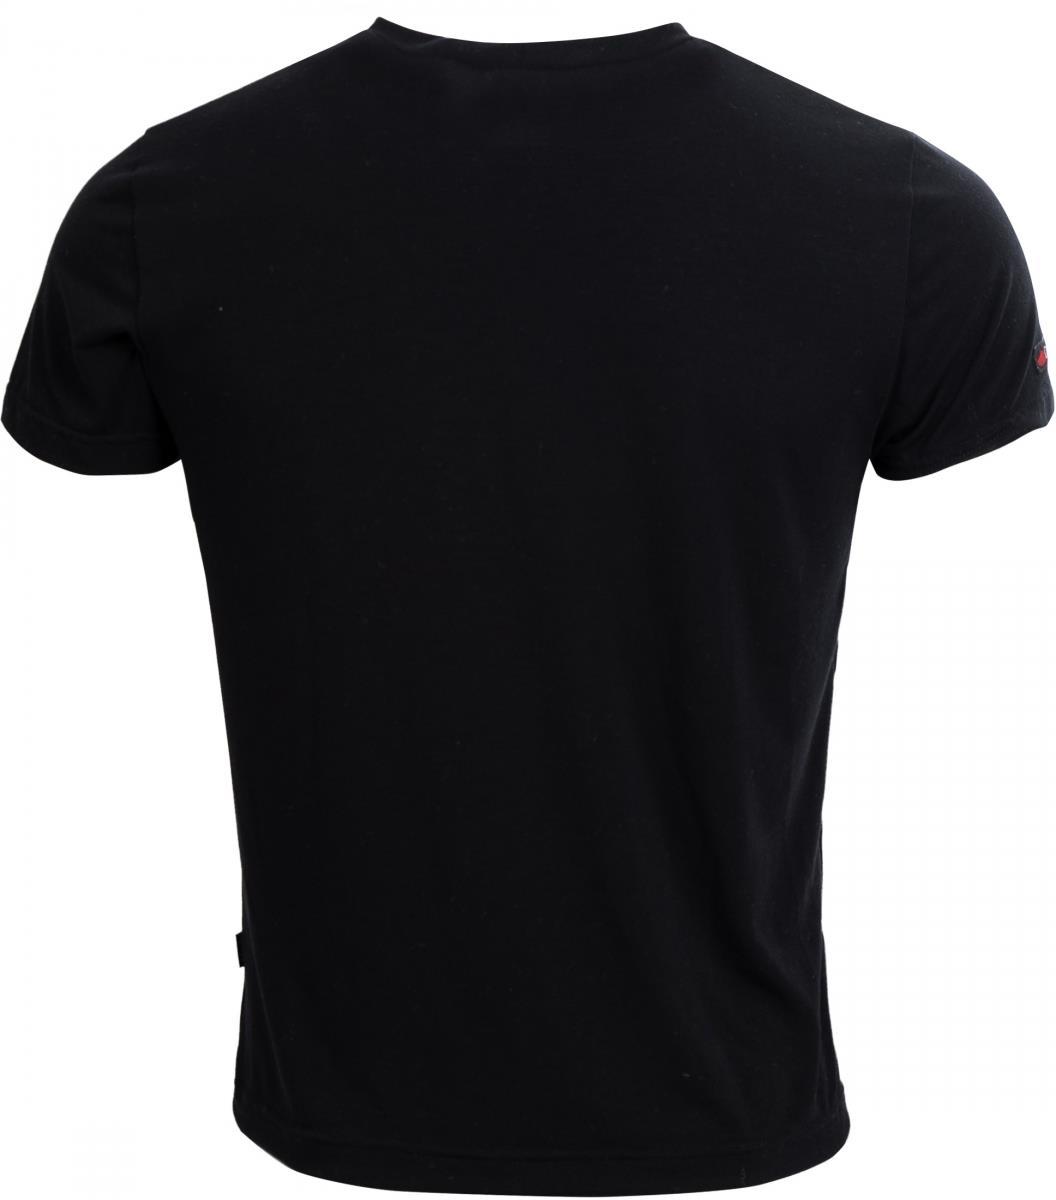 Rukka Outlast thermo t-shirt